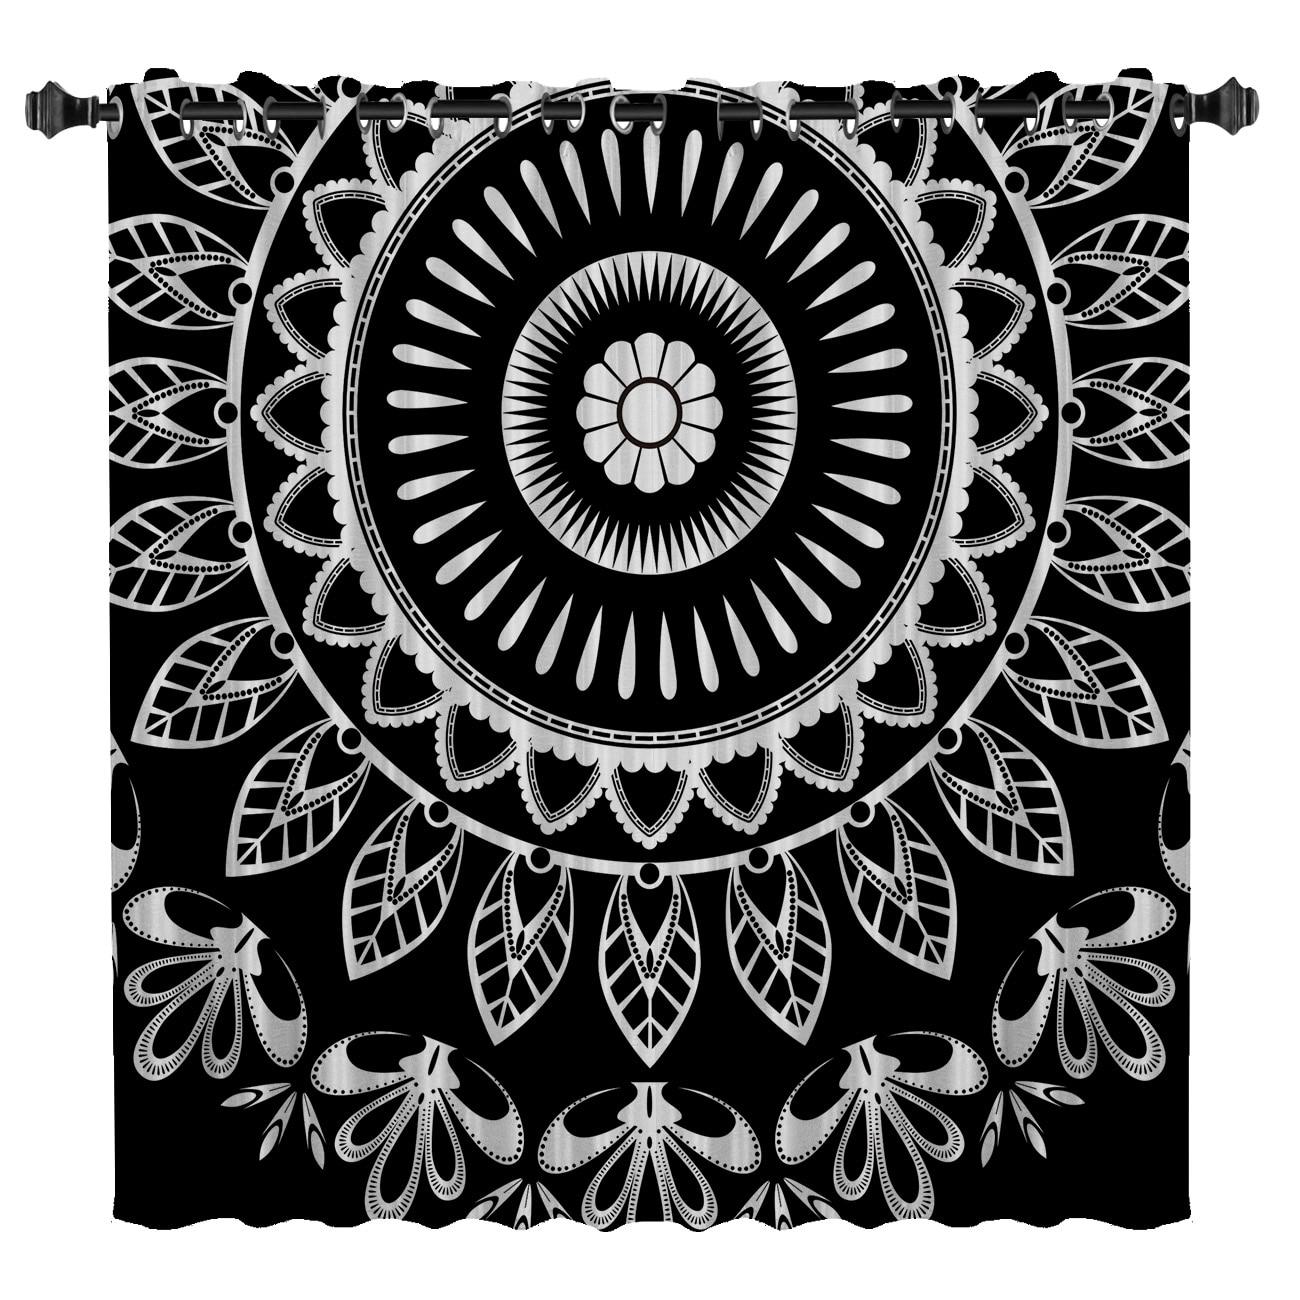 Mandala Datura budismo étnico cortinas de ventana oscuro salón cortinas de habitación baño cocina decoración de tela niños TRATAMIENTO DE VENTANA